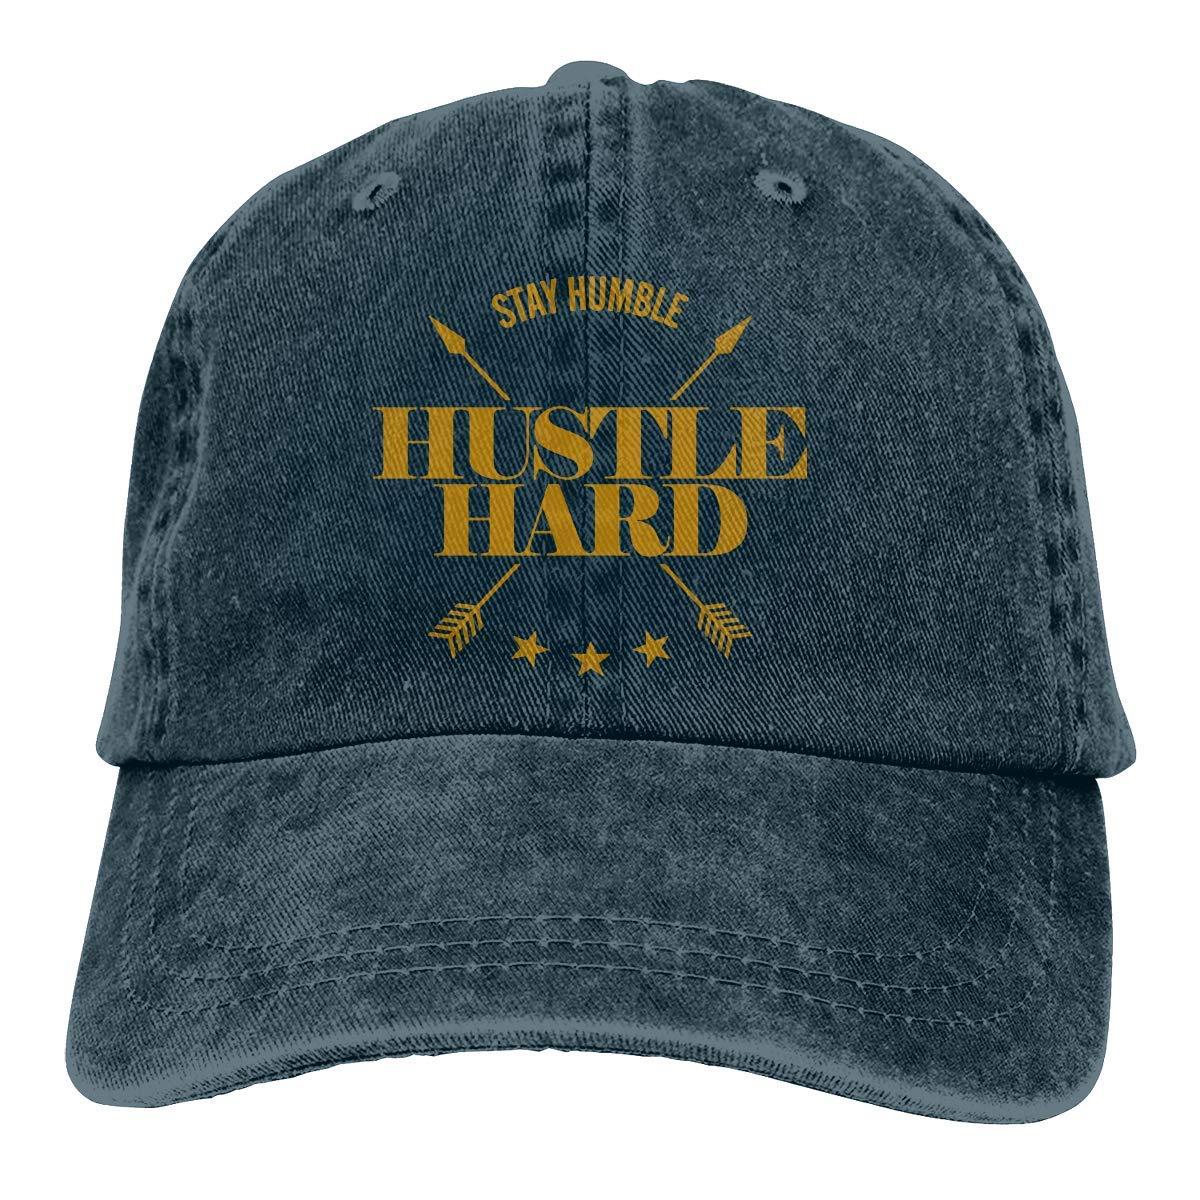 6c2eceb5 Stay Humble, Hustle Hard Denim Dad Cap Baseball Hat Adjustable Sun Cap at  Amazon Men's Clothing store: